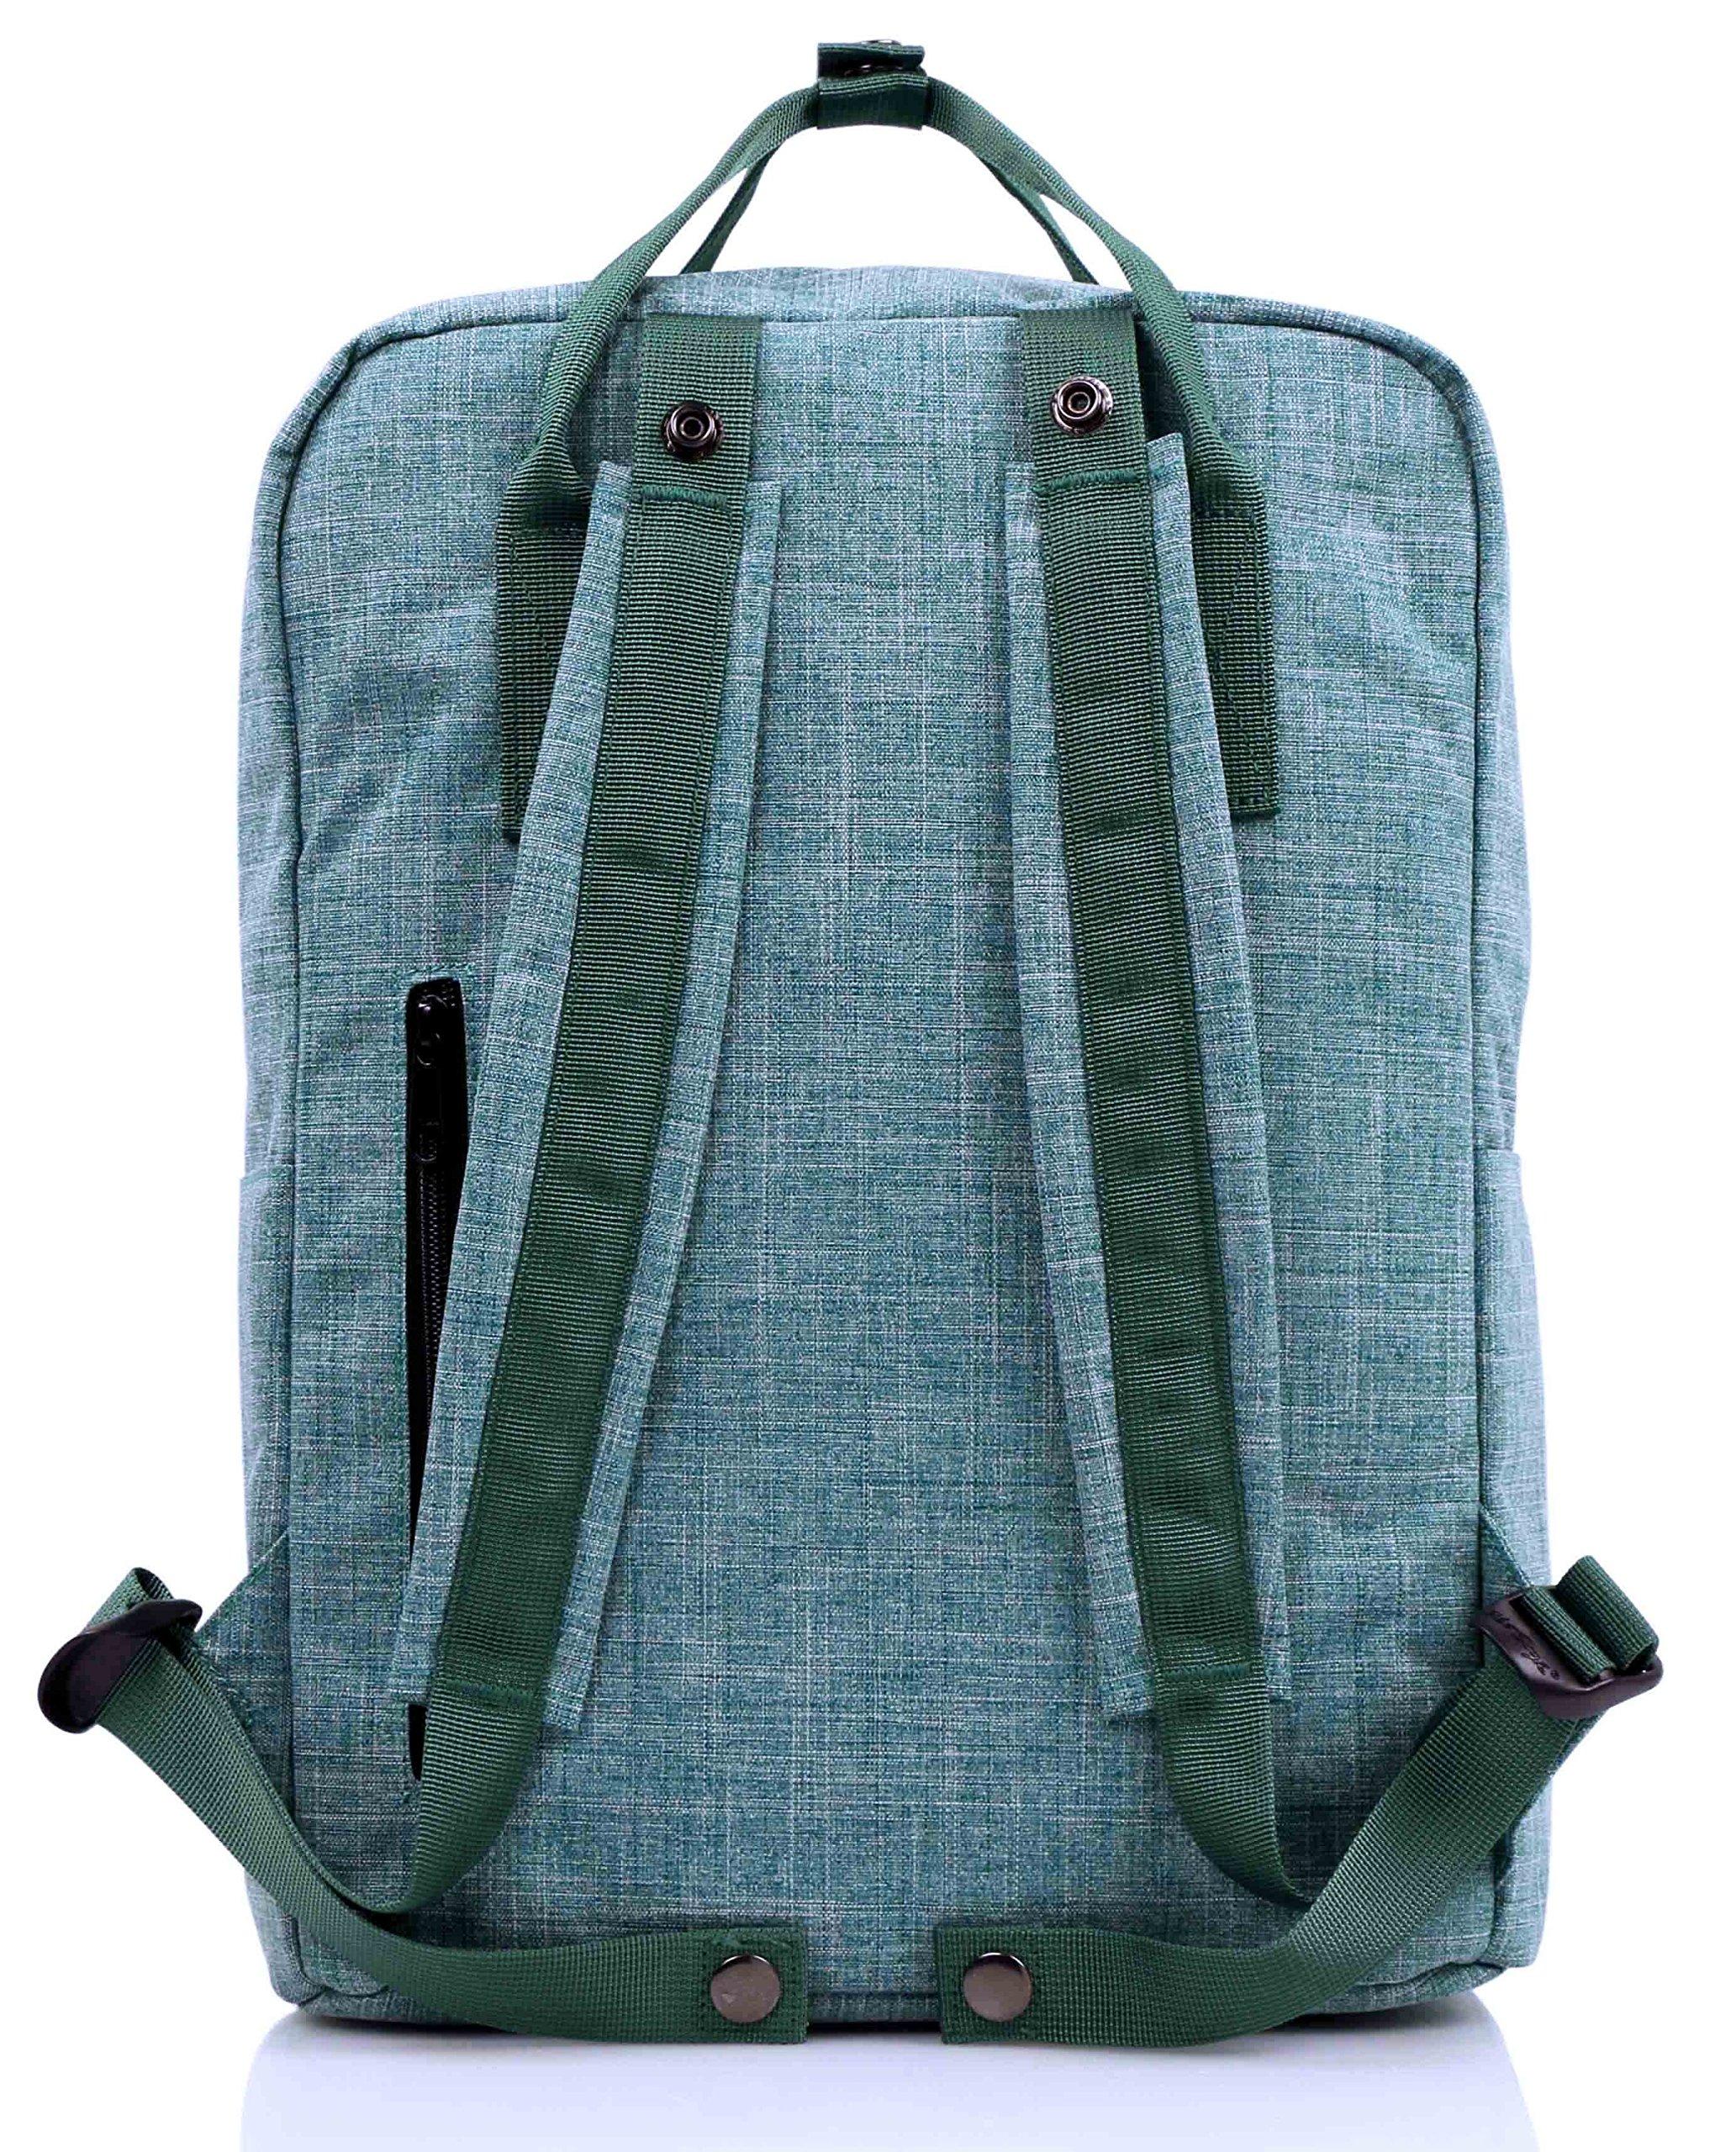 BESTIE Small Travel Backpack - Cute Baby Diaper Bag Lightweight for ... 954e969b4d